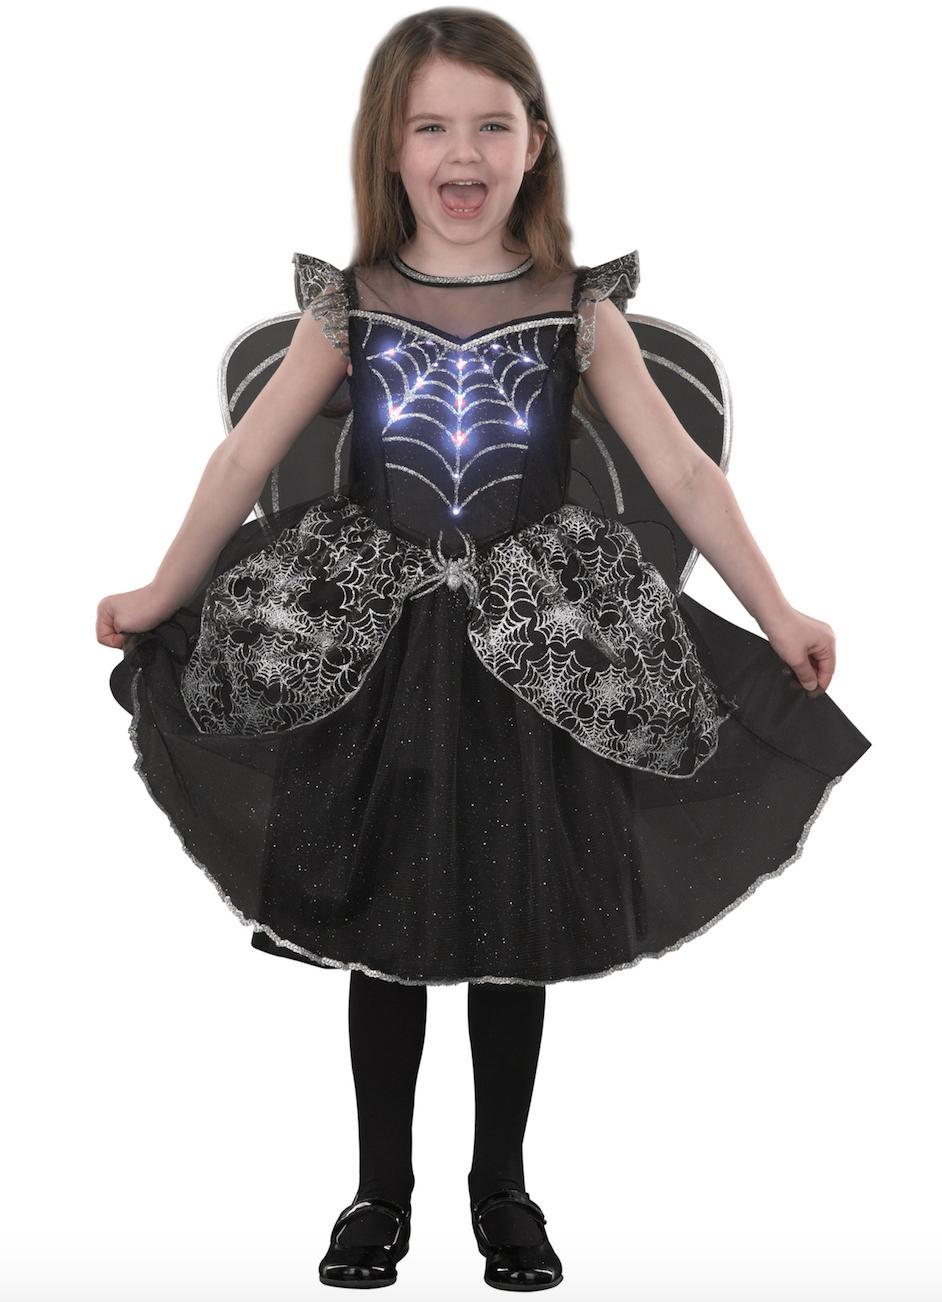 The Best Kids39 Halloween Costumes To Buy Last Minute Heart